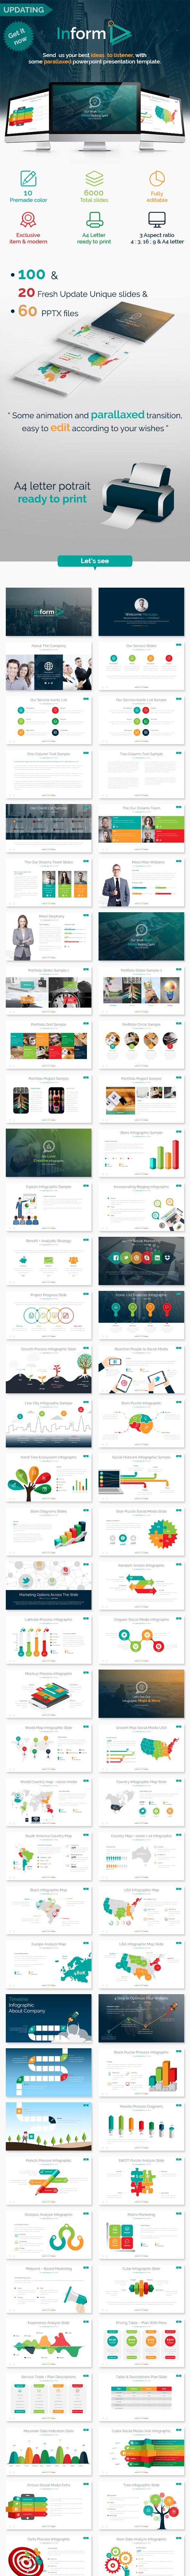 INFORM - Multipurpose Presentation Template - Business PowerPoint Templates